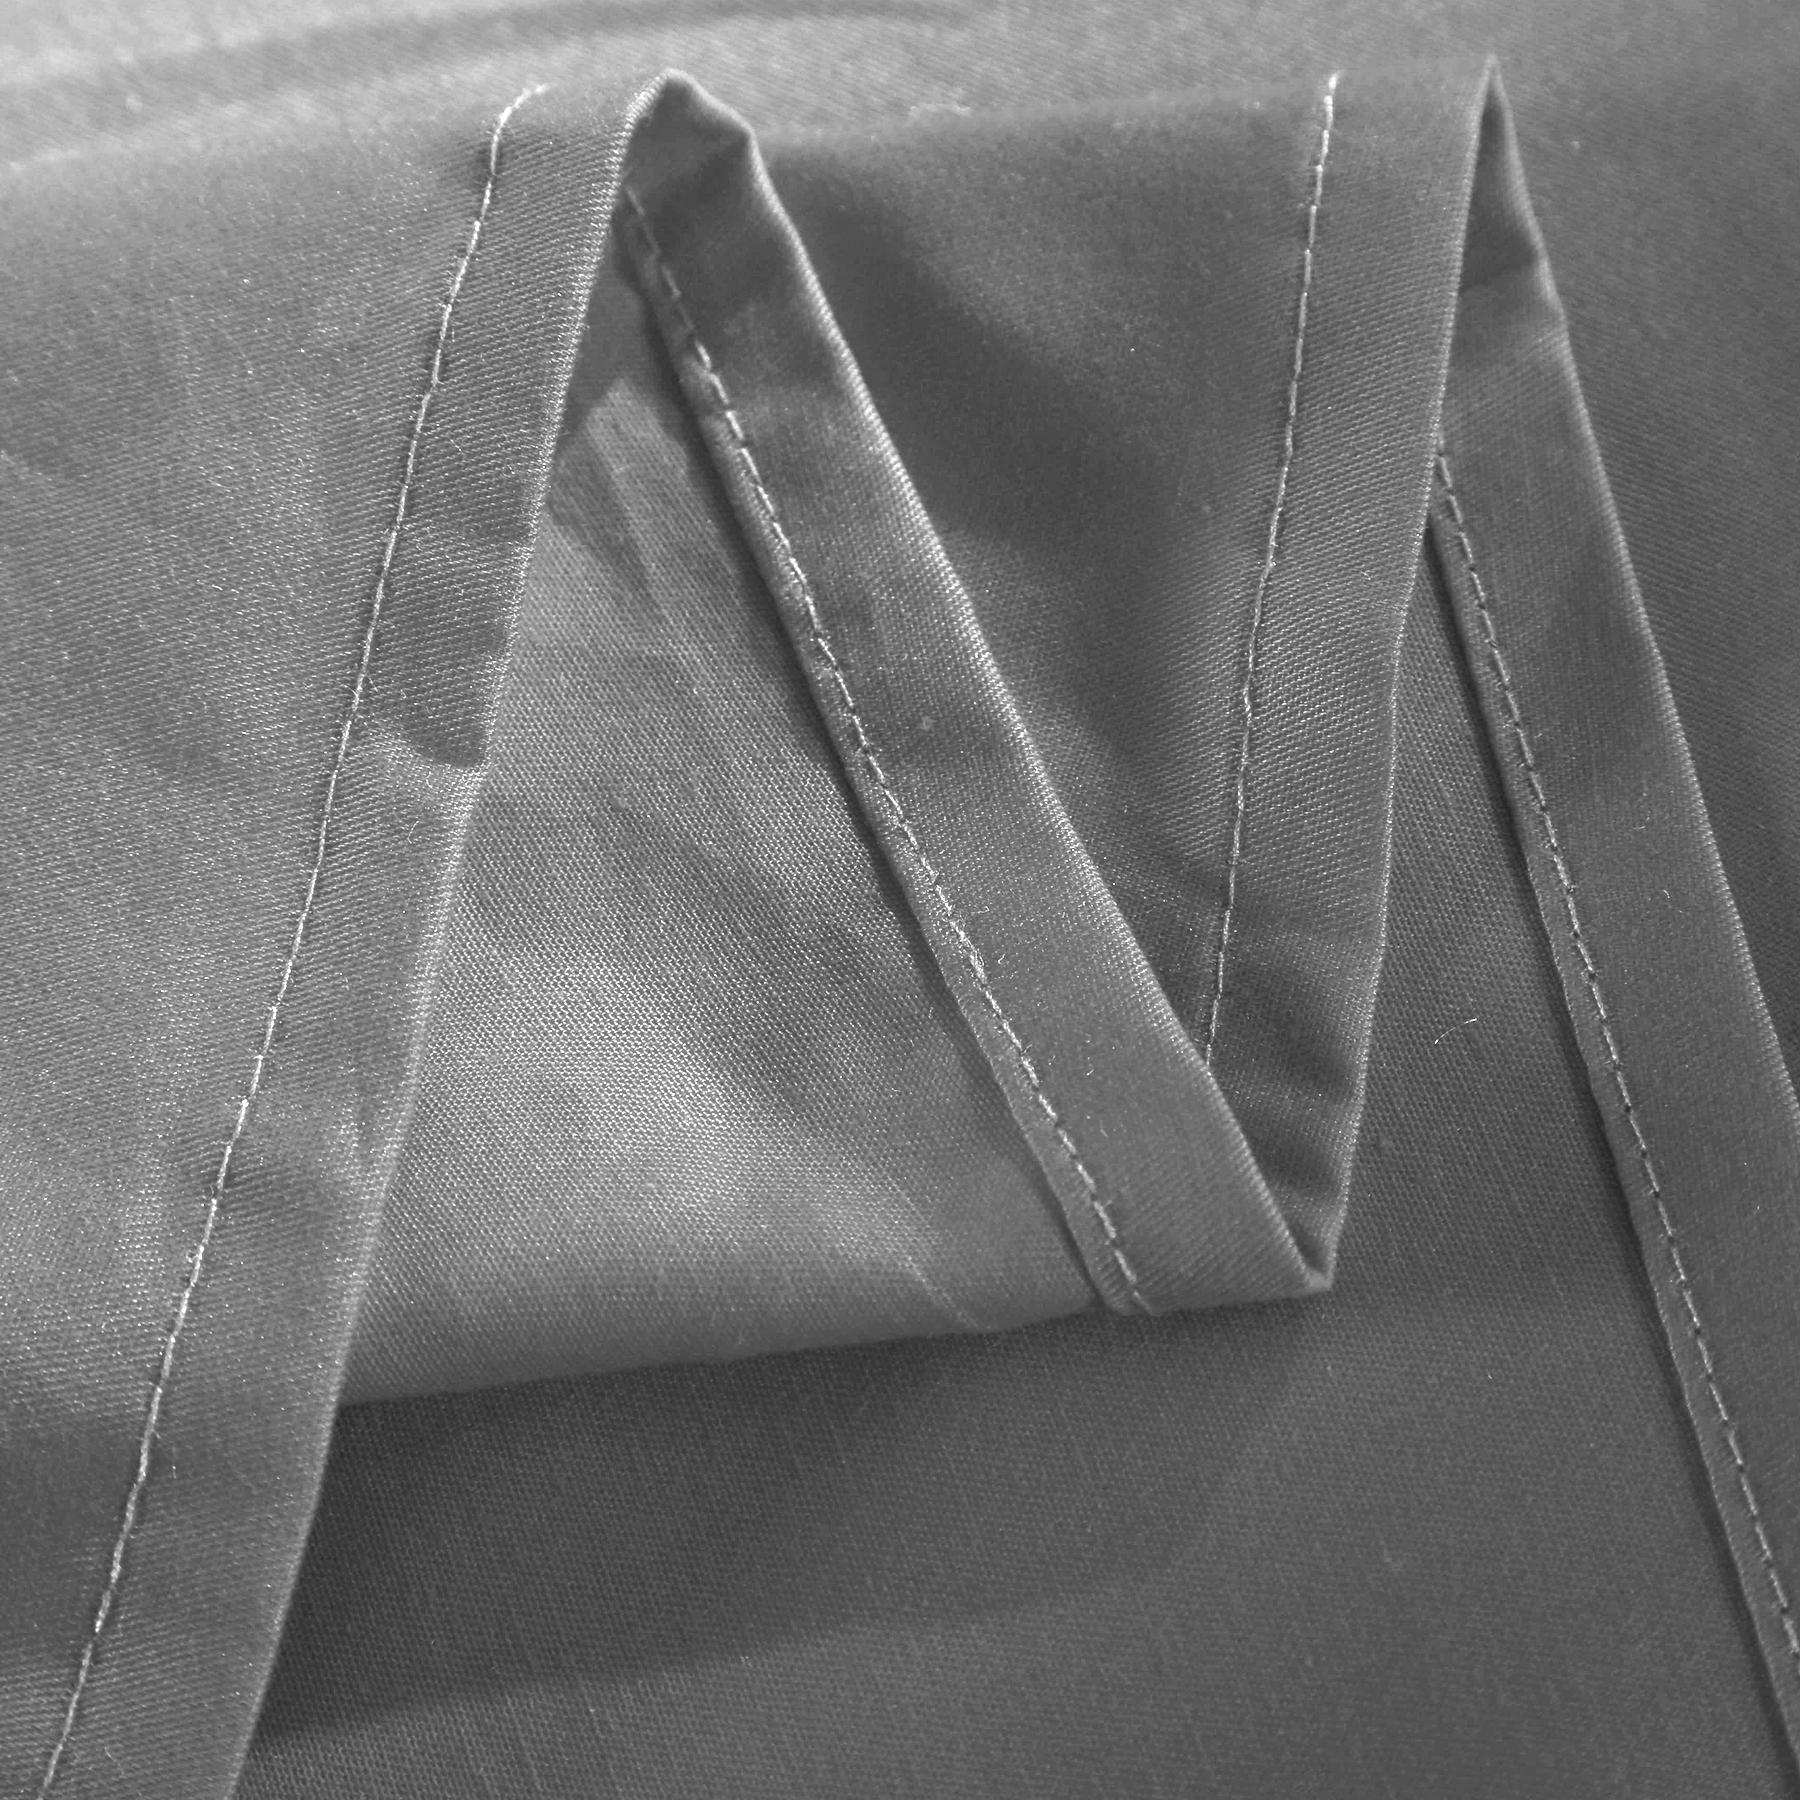 2x tagesdecke bettlaken bett berwurf baumwolle dunkelgrau 240x250cm bw5003dgr 2 ebay. Black Bedroom Furniture Sets. Home Design Ideas